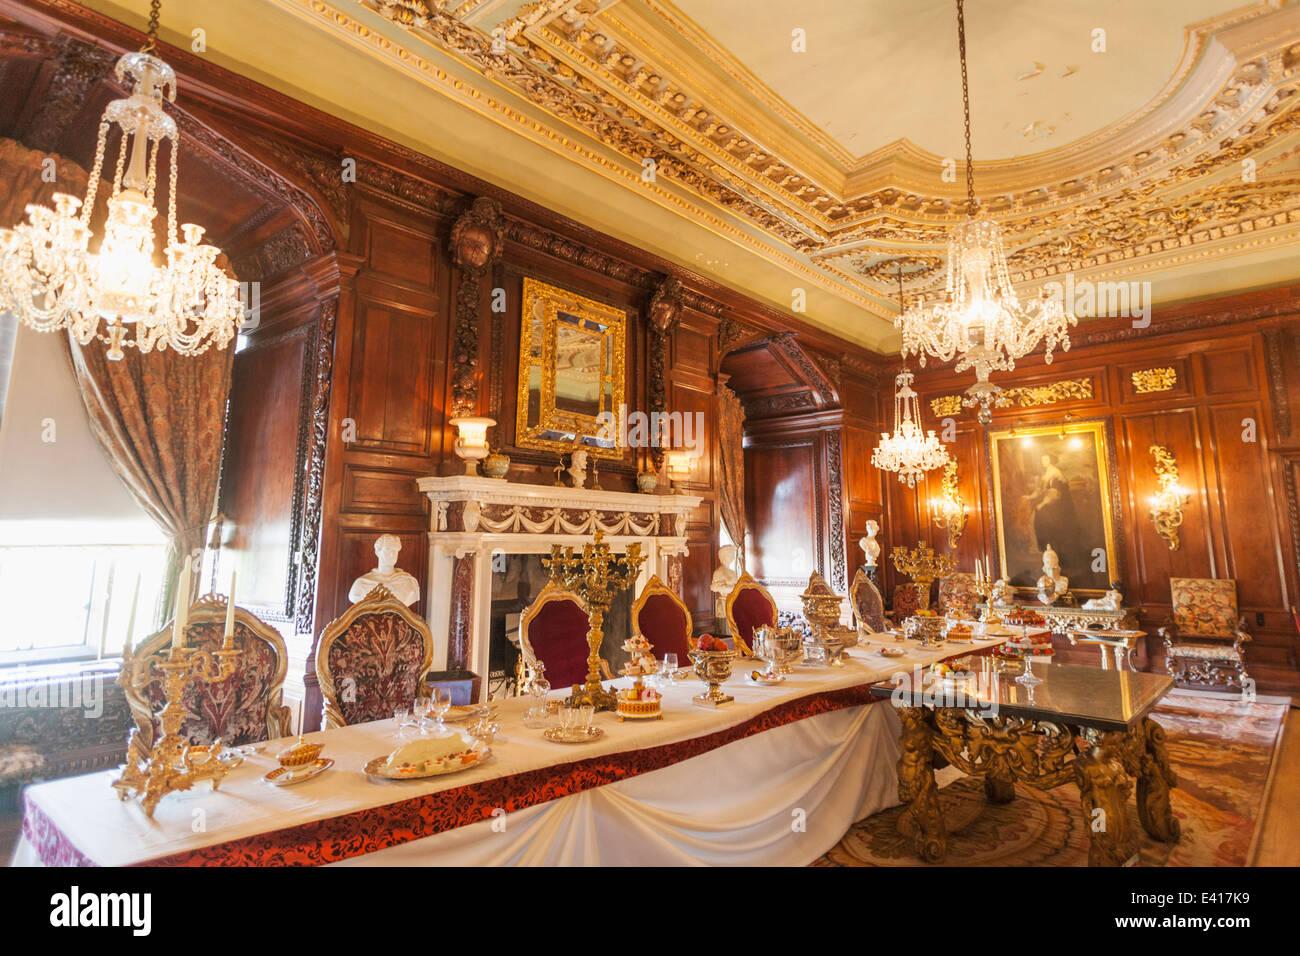 castle interior stock photos & castle interior stock images - alamy